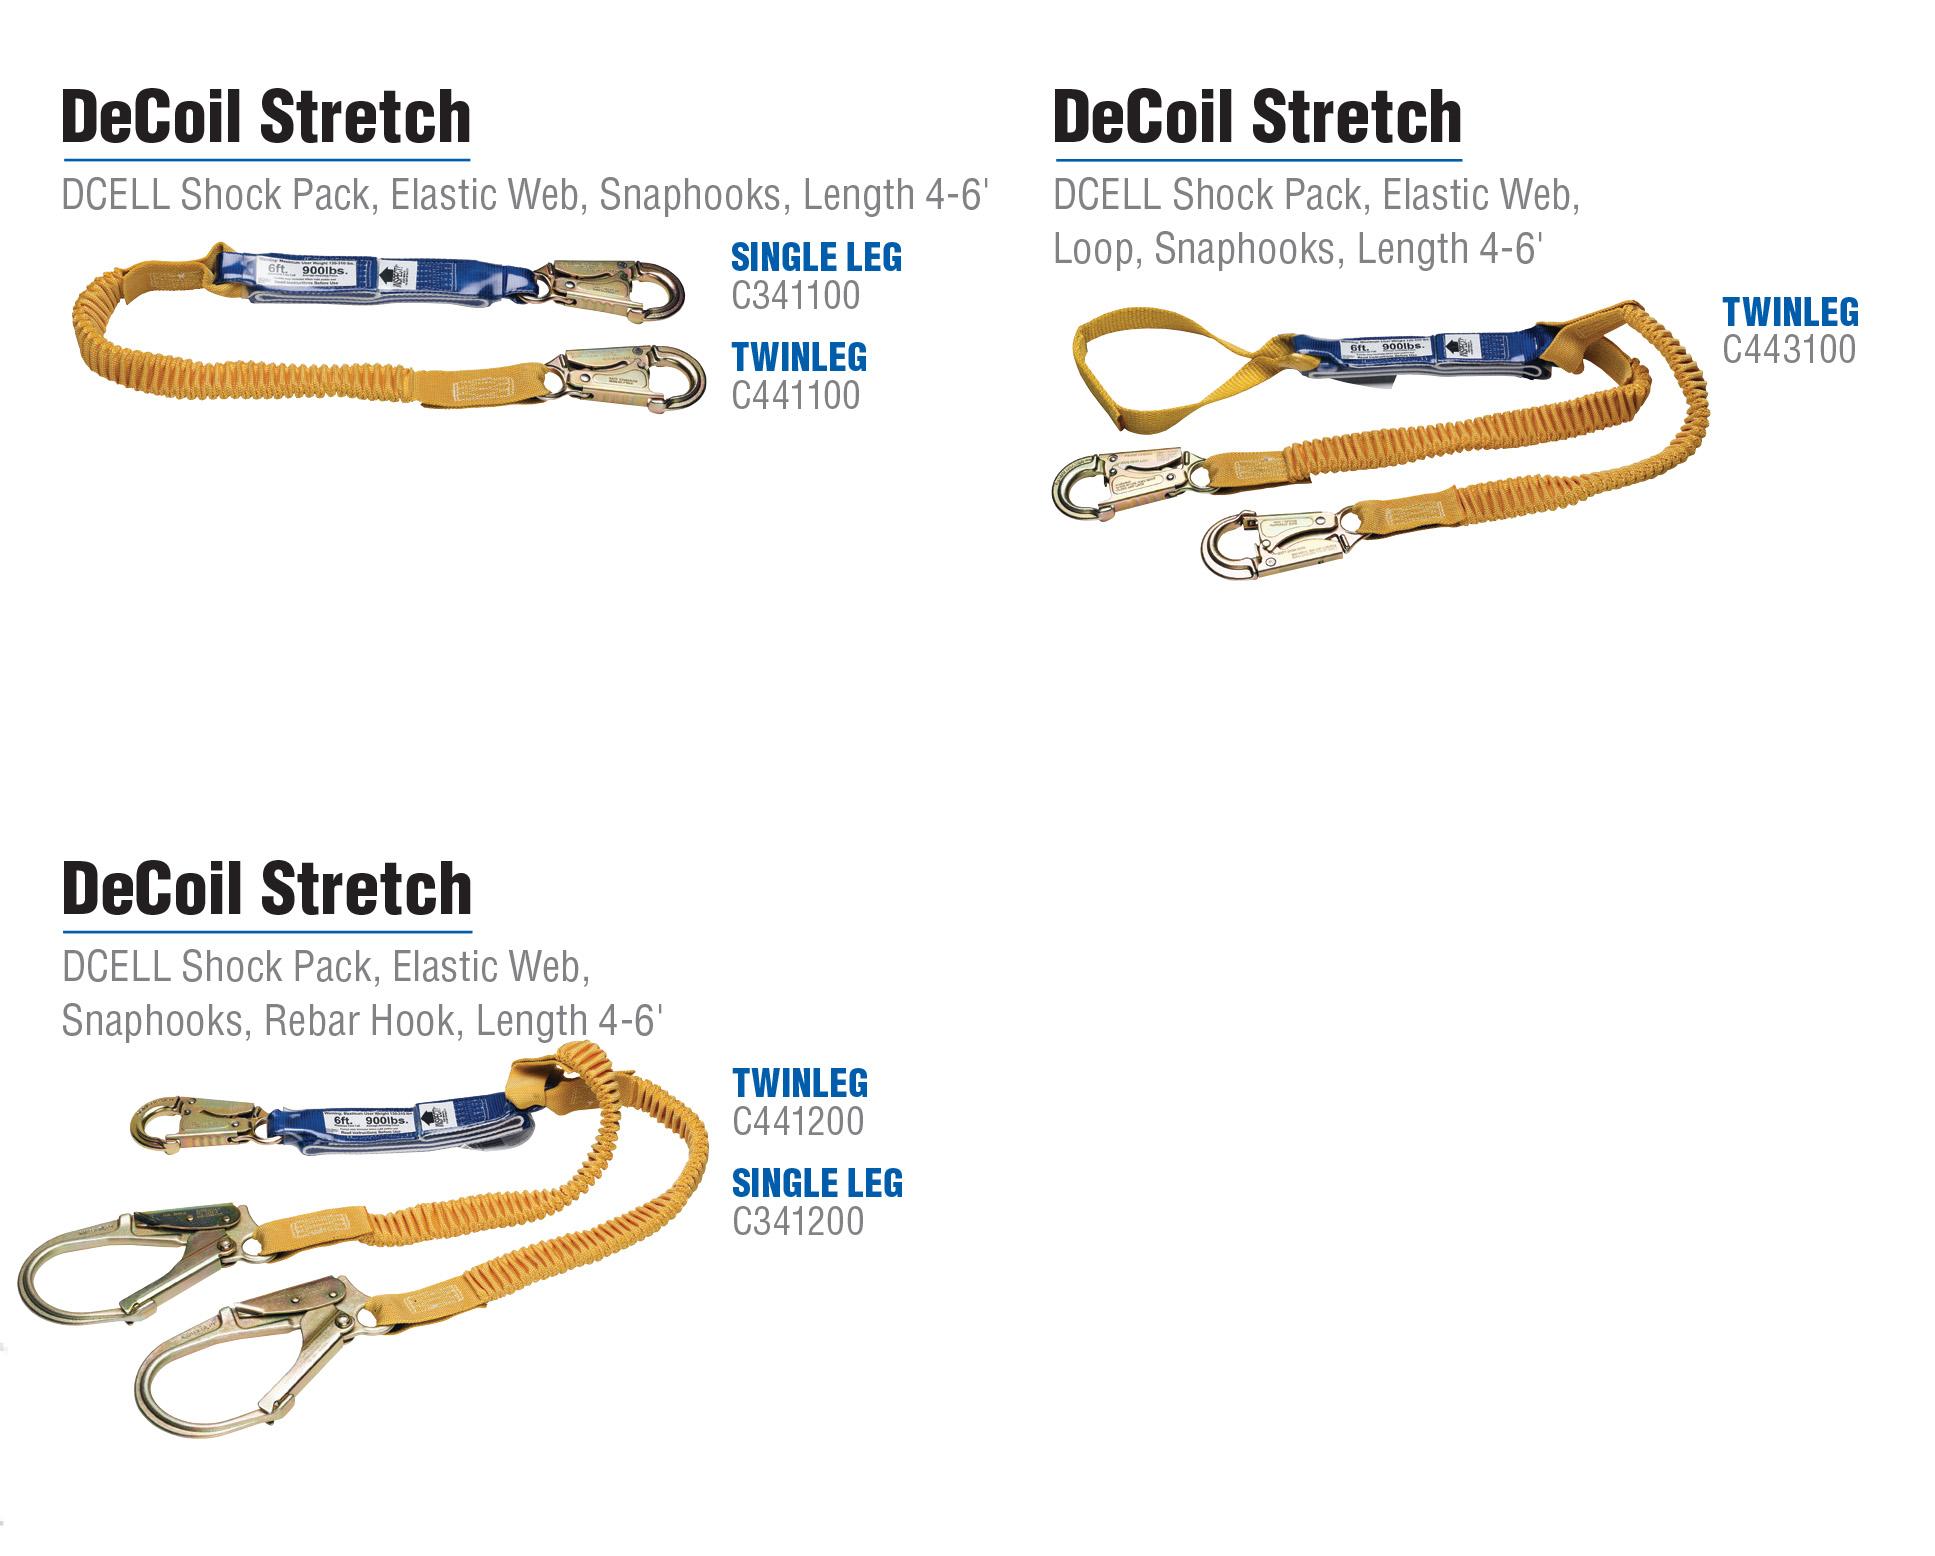 decoil-stretch.jpg